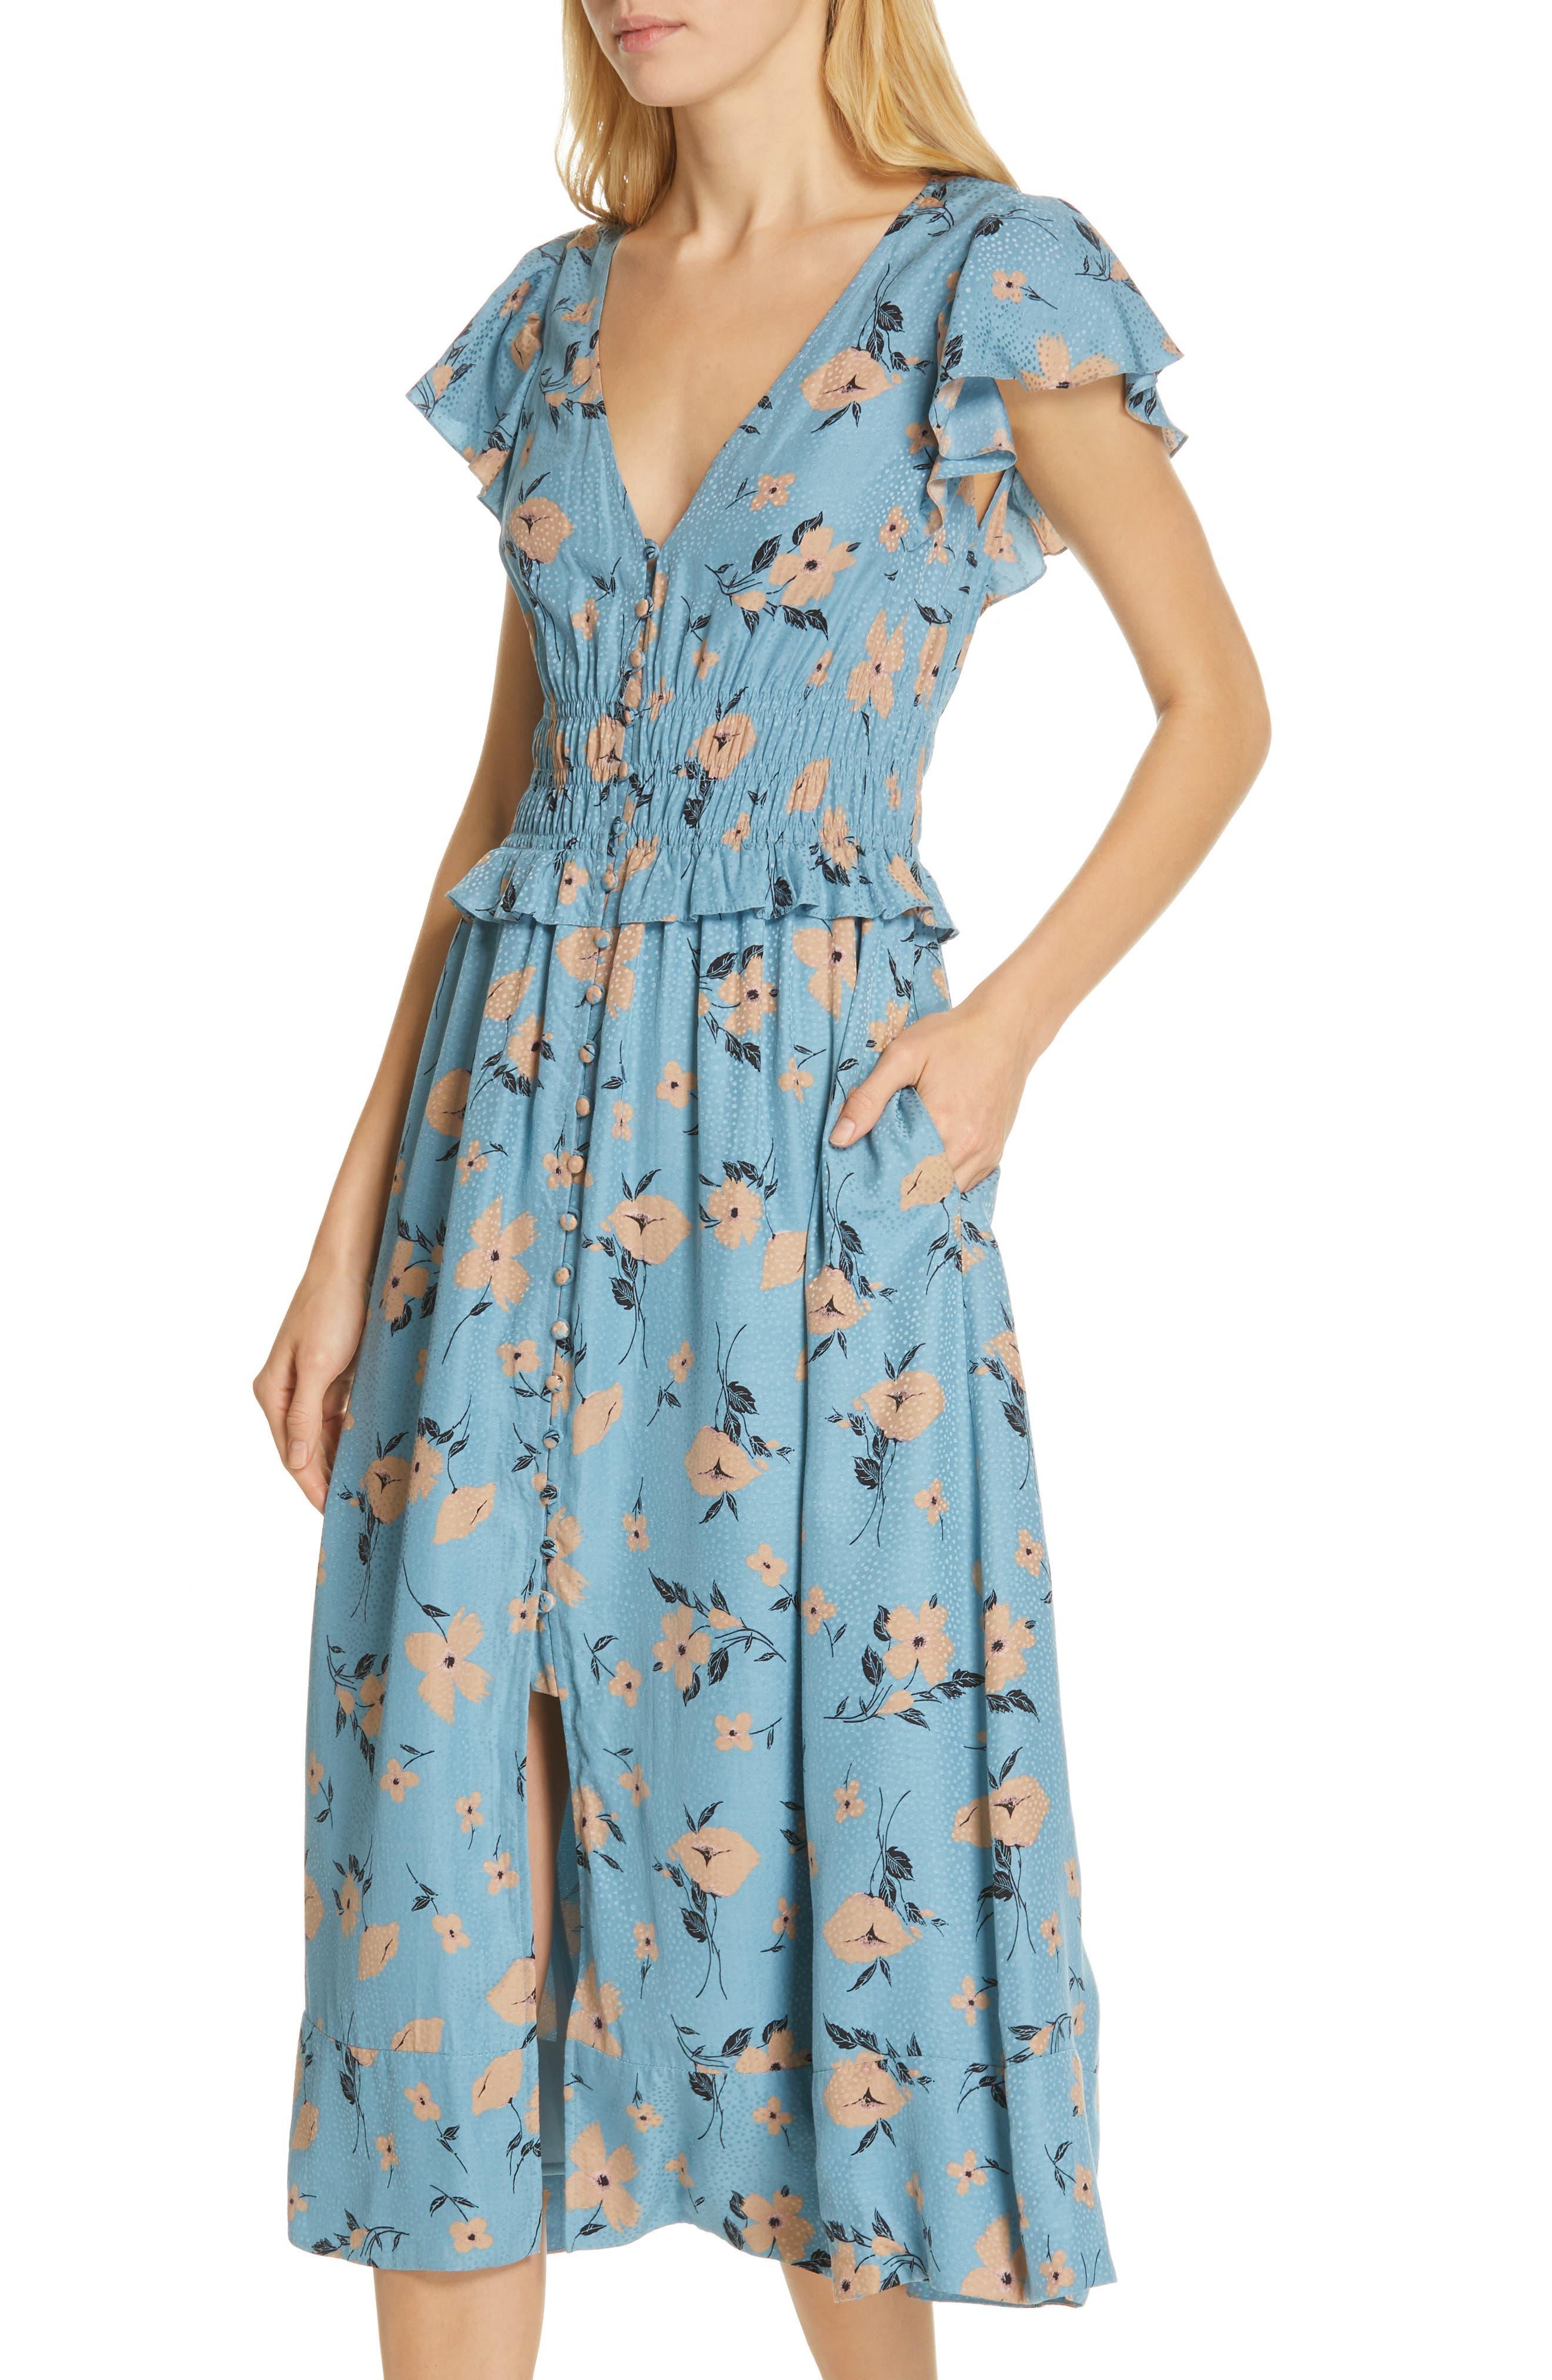 REBECCA TAYLOR,                             Daniella Floral Jacquard Silk Blend Dress,                             Alternate thumbnail 4, color,                             LAGOON COMBO